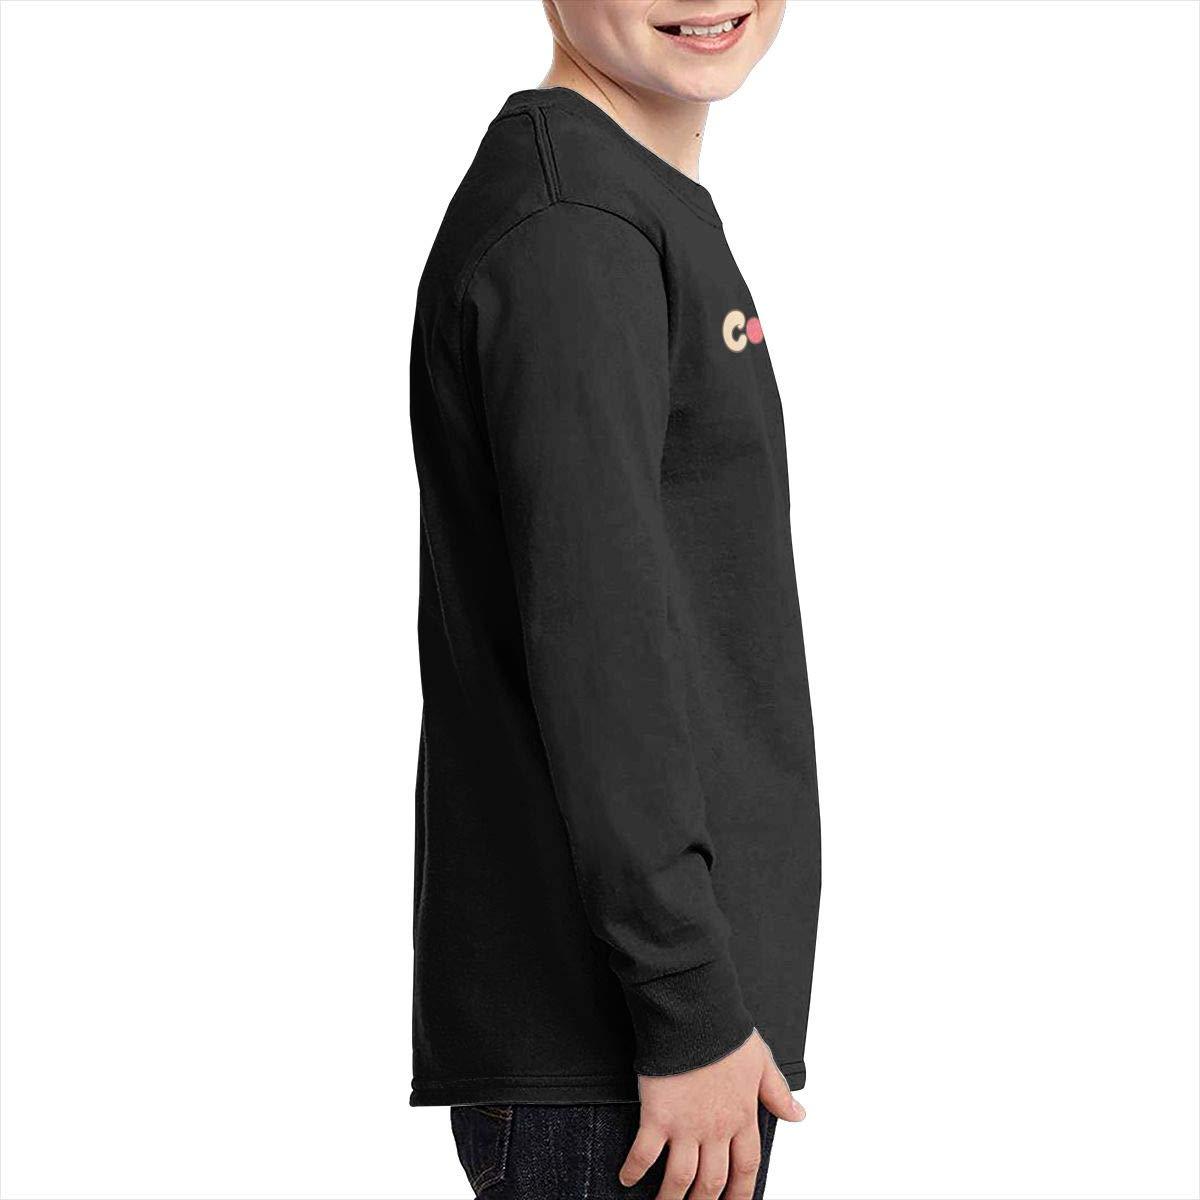 Optumus Cookie Swirl C Kids Sweatshirts Long Sleeve T Shirt Boy Girl Children Teenagers Unisex Tee